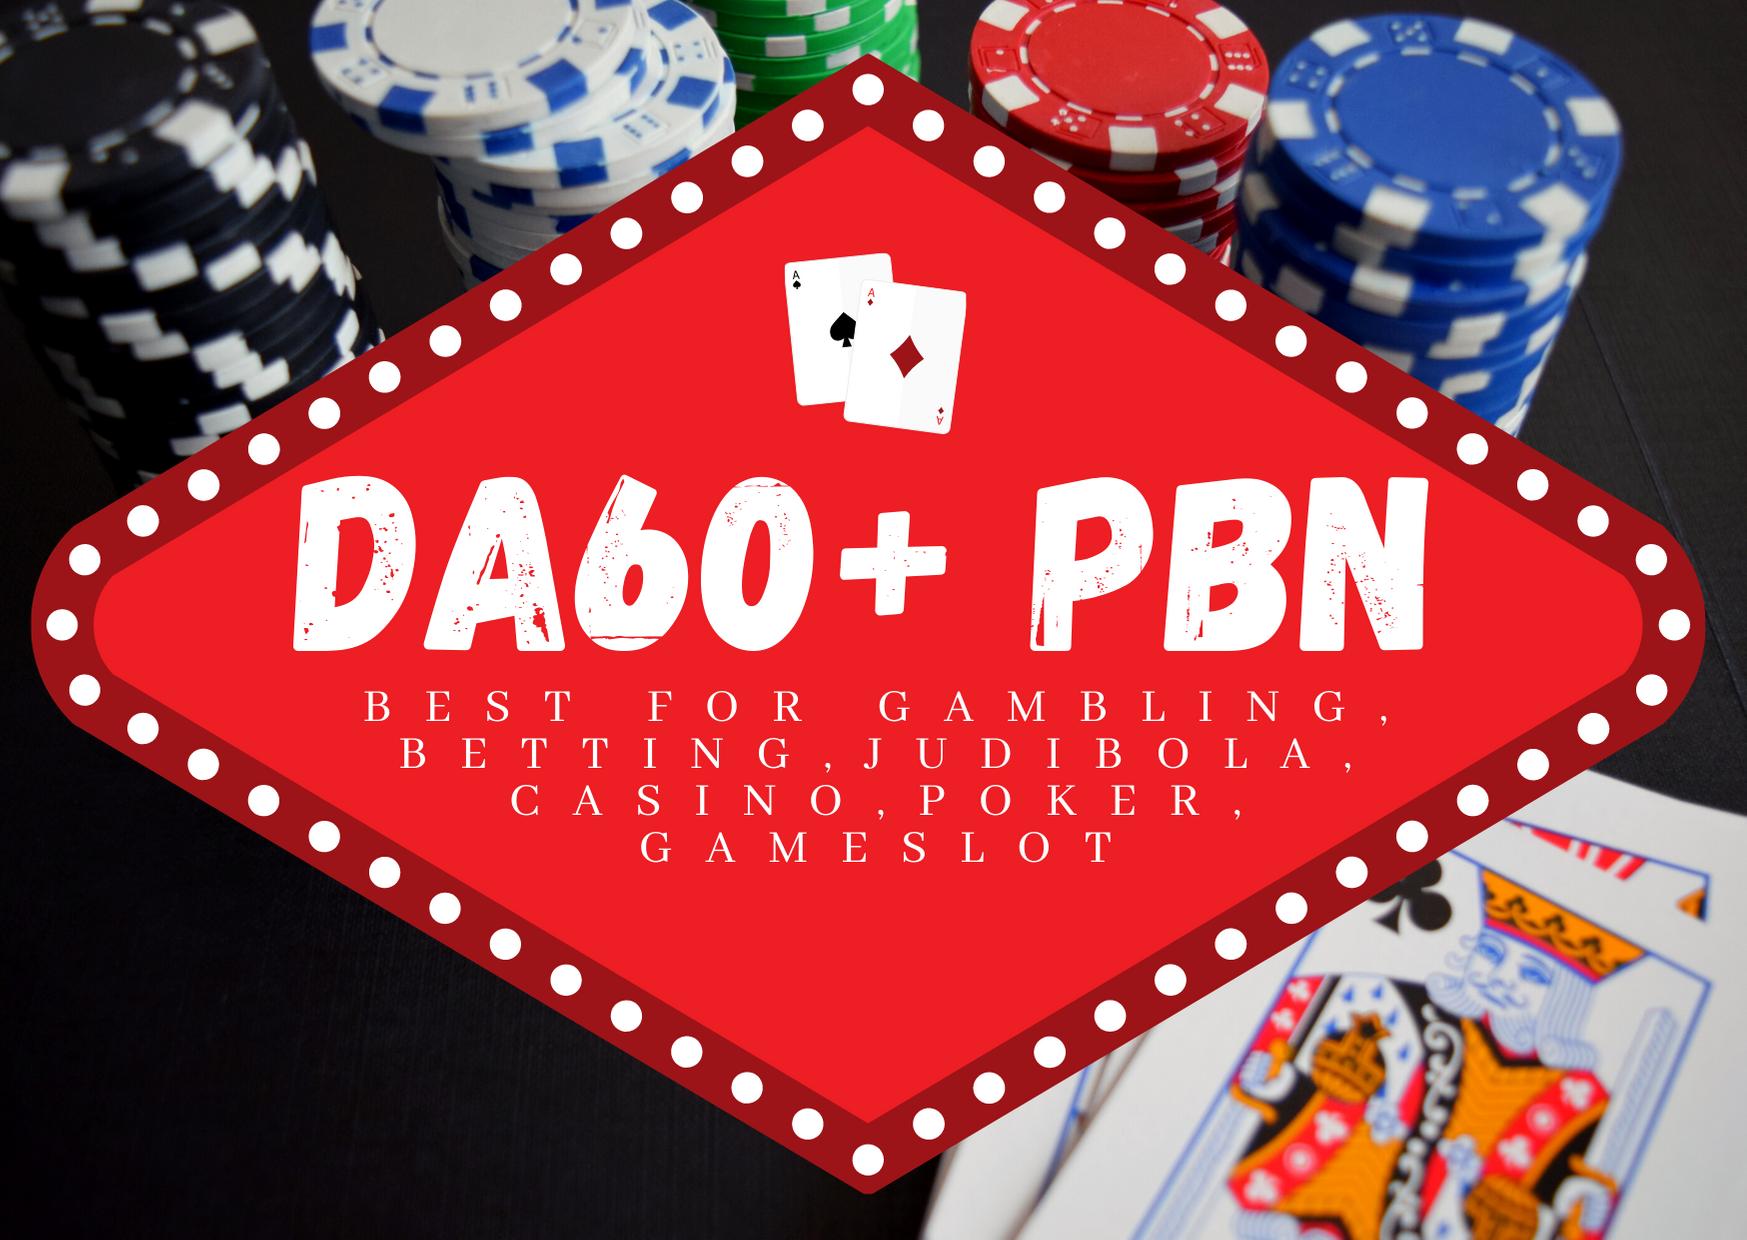 500 High DA 60+ Casino, Gambling, Poker Niche PBN Links